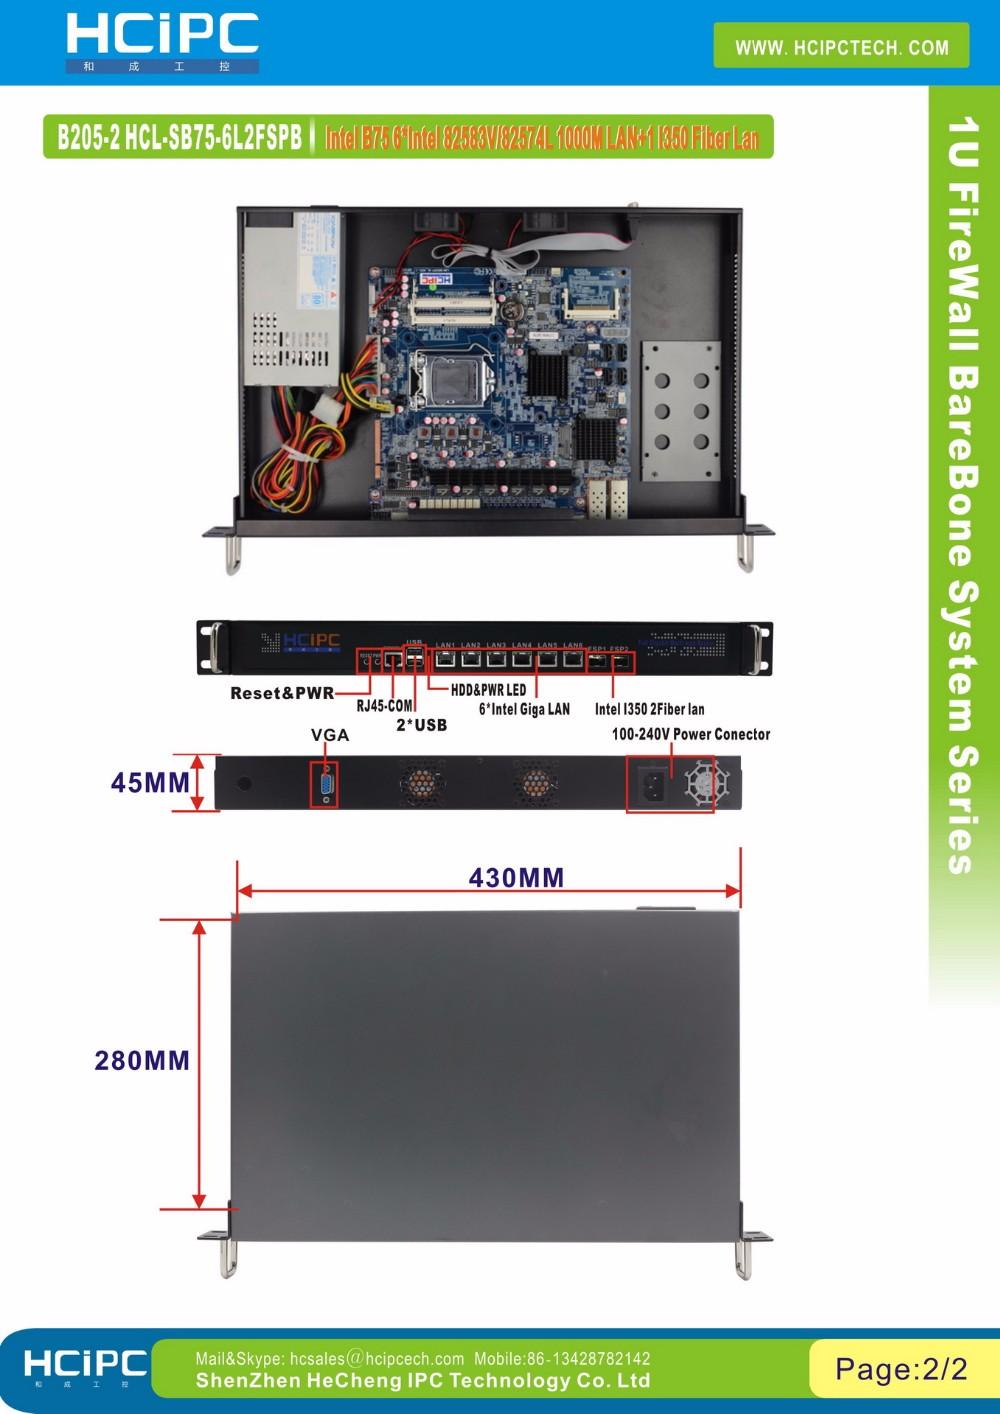 B205-2 HCL-SB75-6L2FSPB EN-2